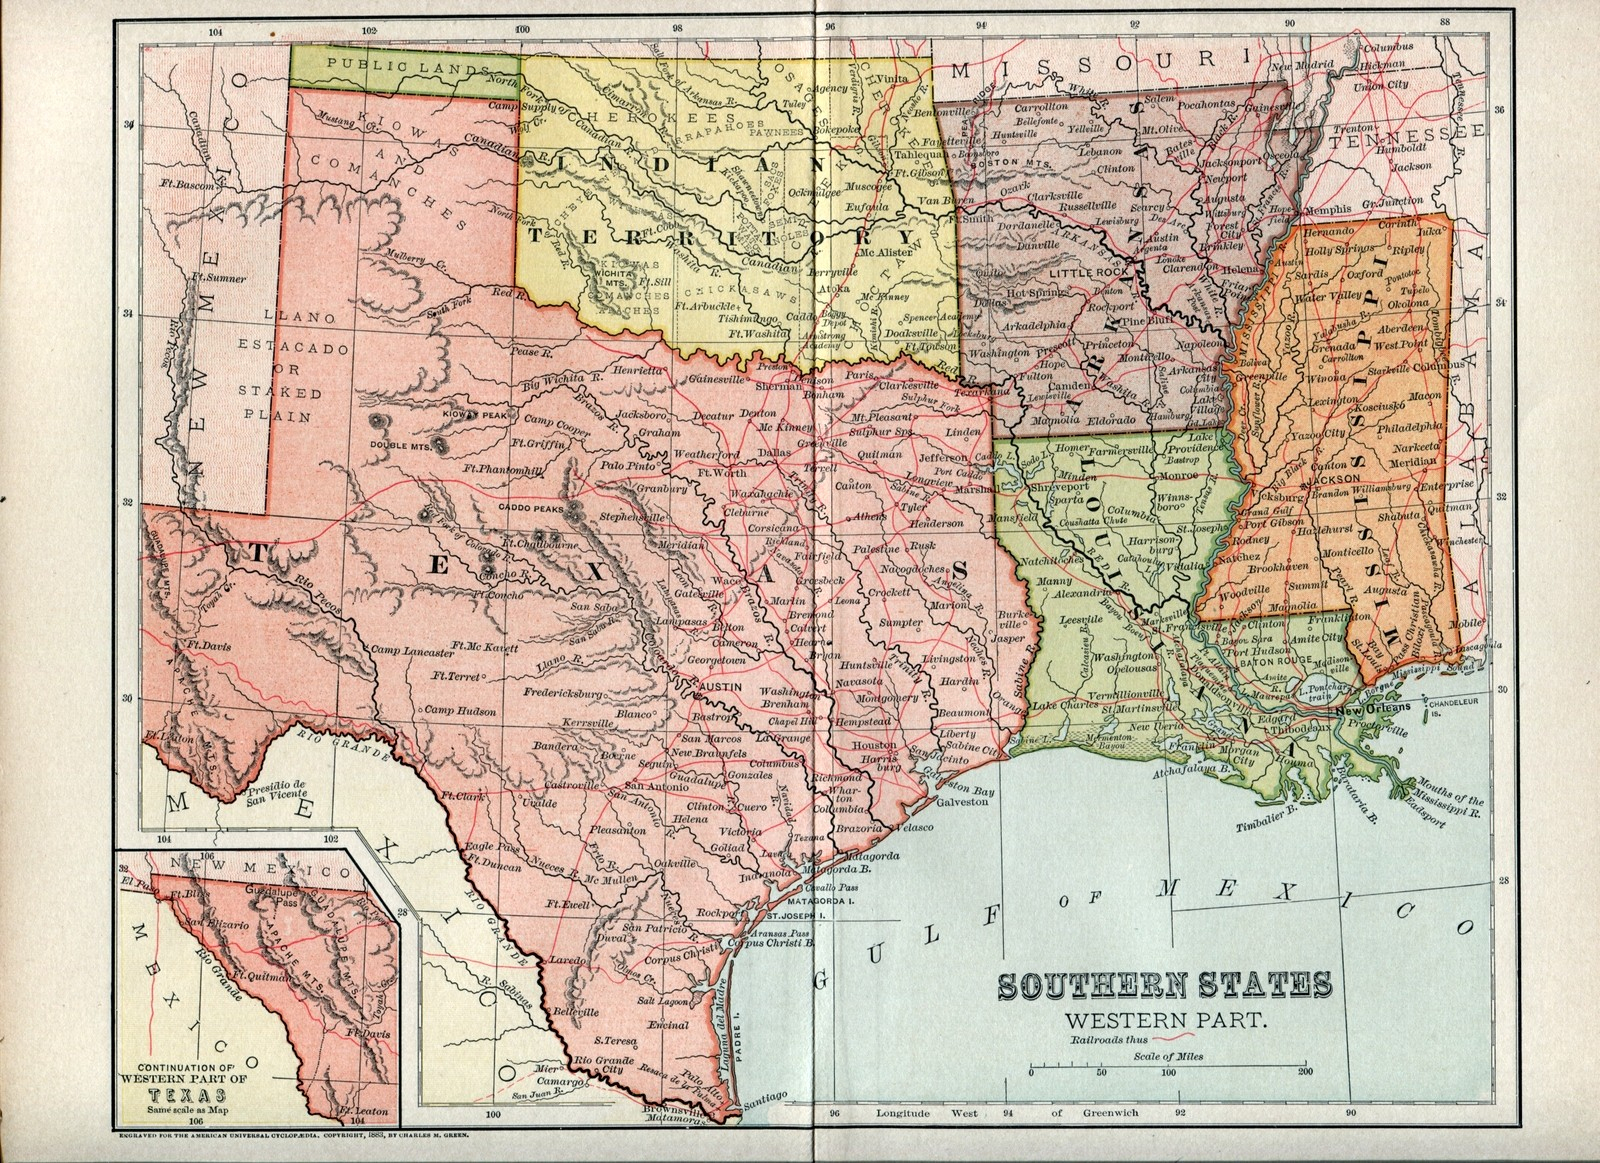 Ic87 020A 19 Maps Of Texas And Louisiana | Settoplinux - Texas Louisiana Map